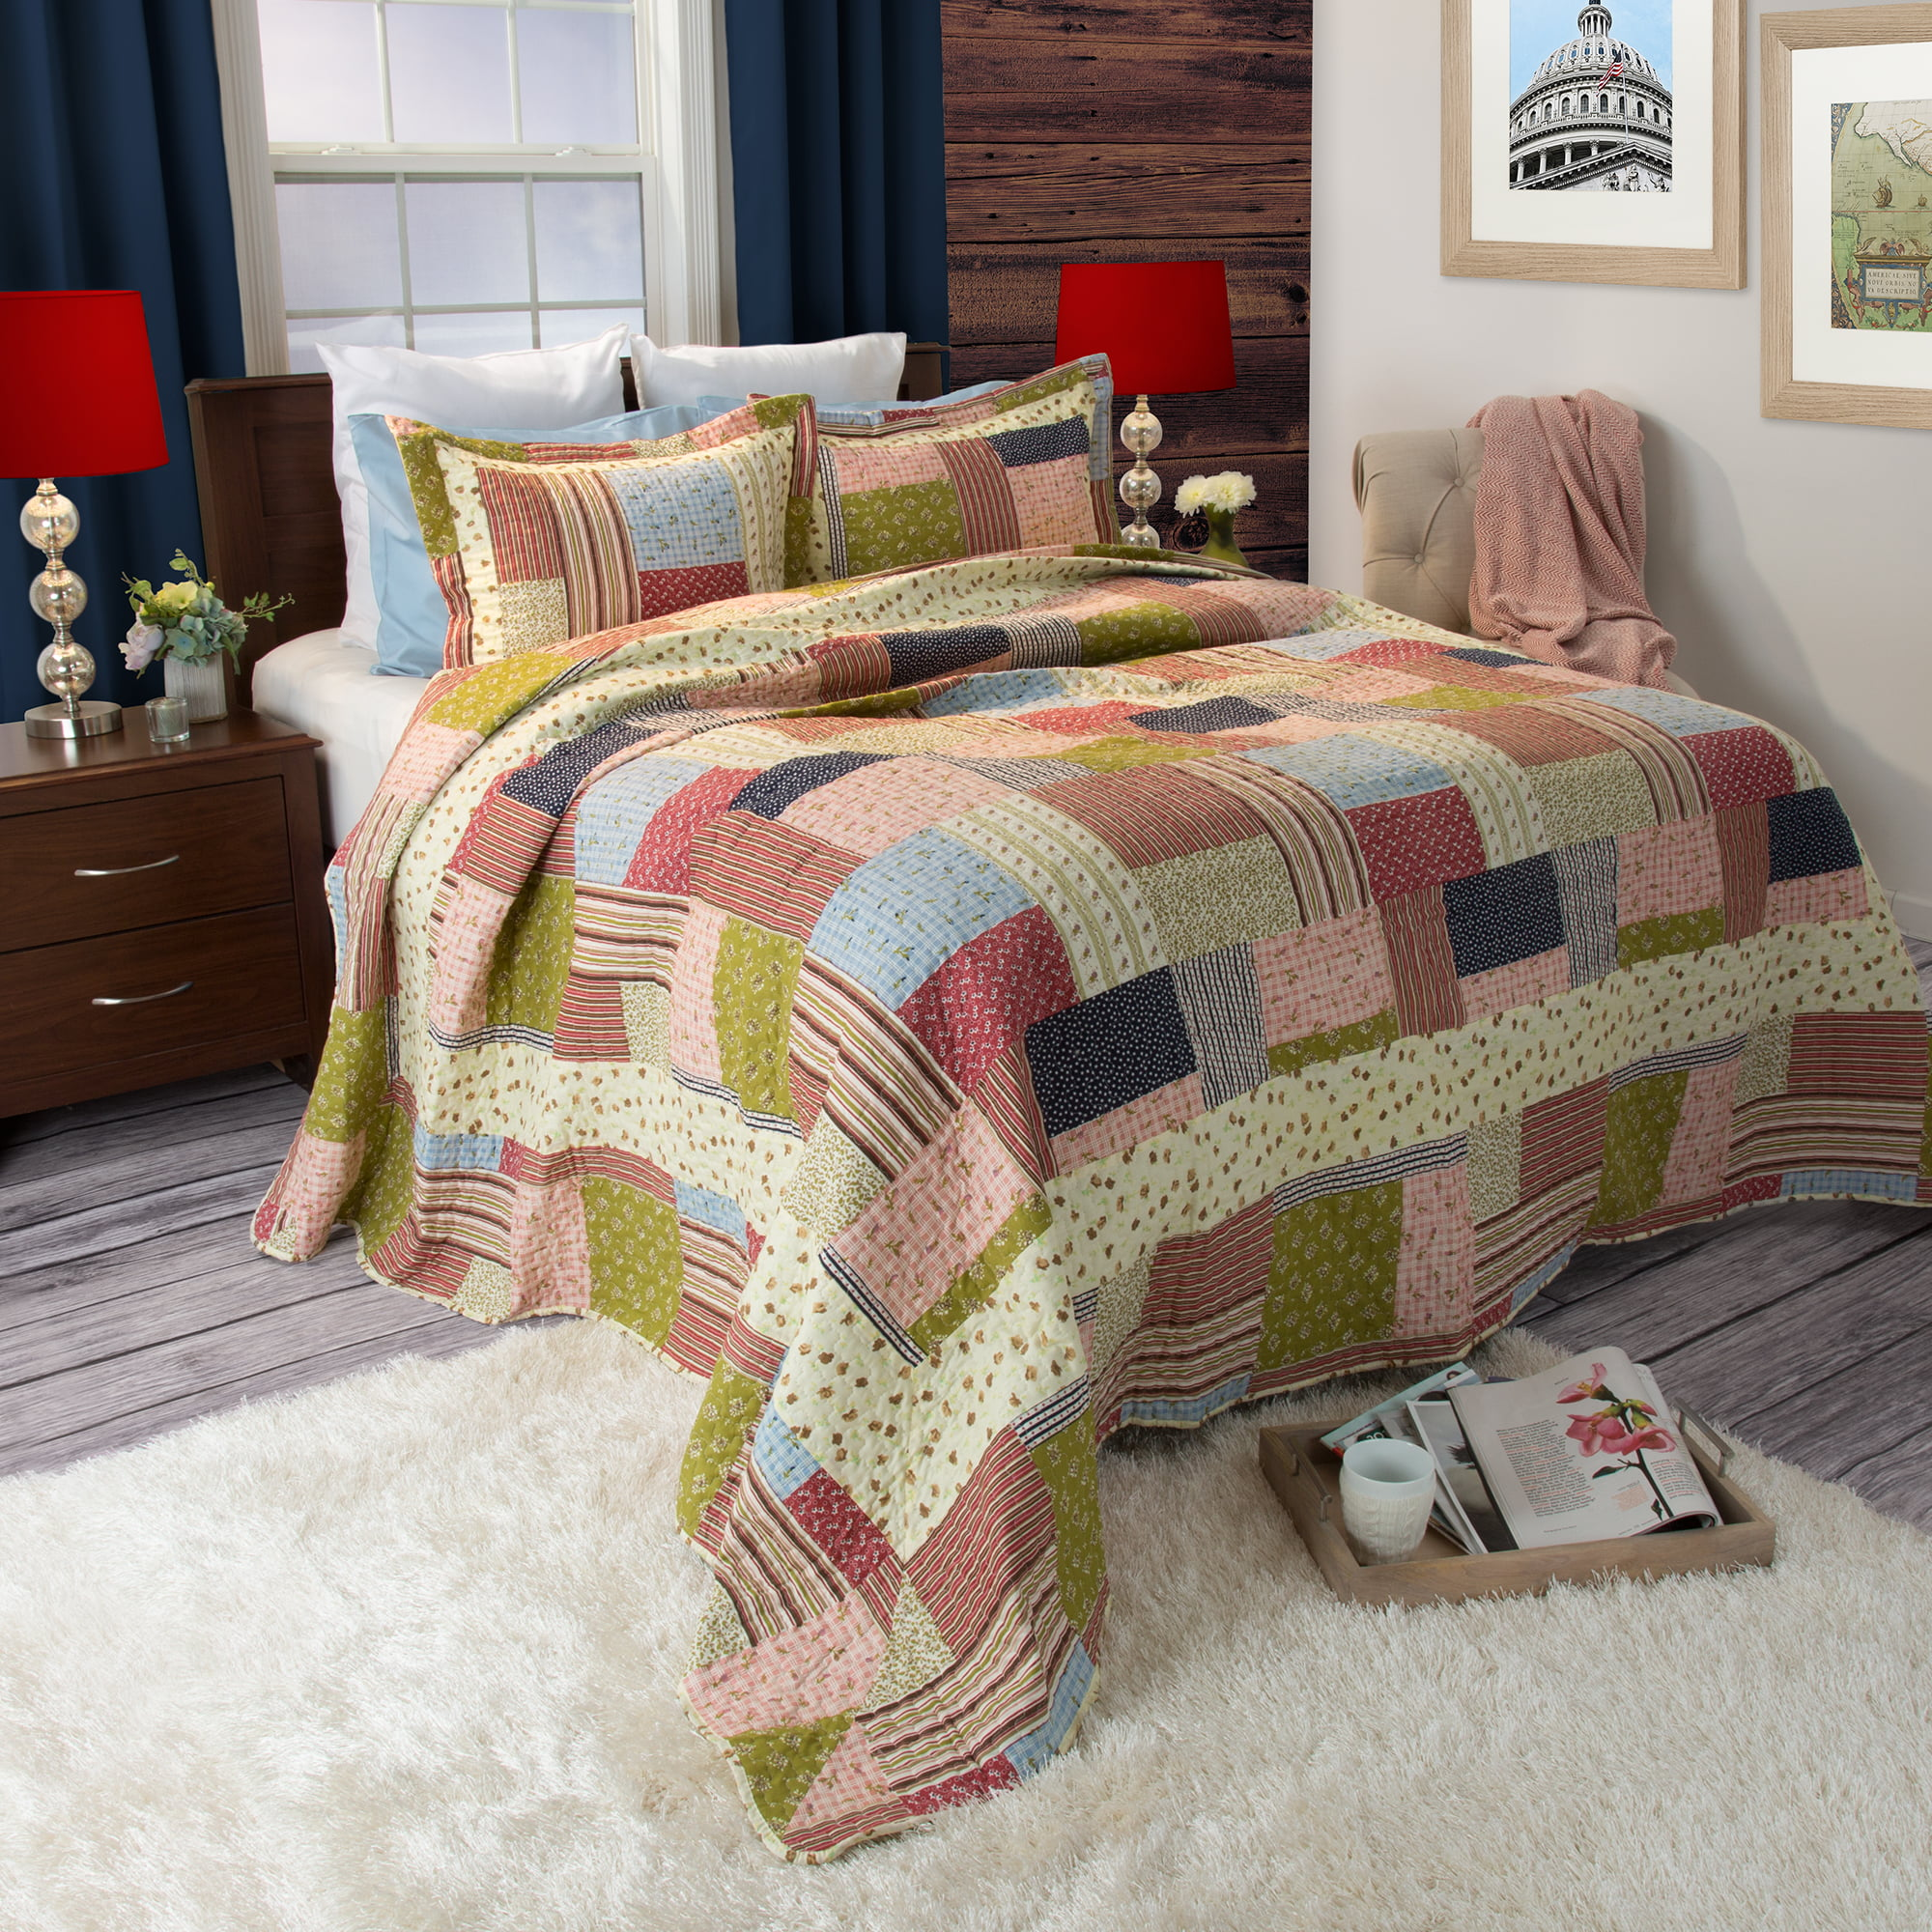 Somerset Home Printed Savannah 3 Piece Quilt Bedding Set by Trademark Global LLC